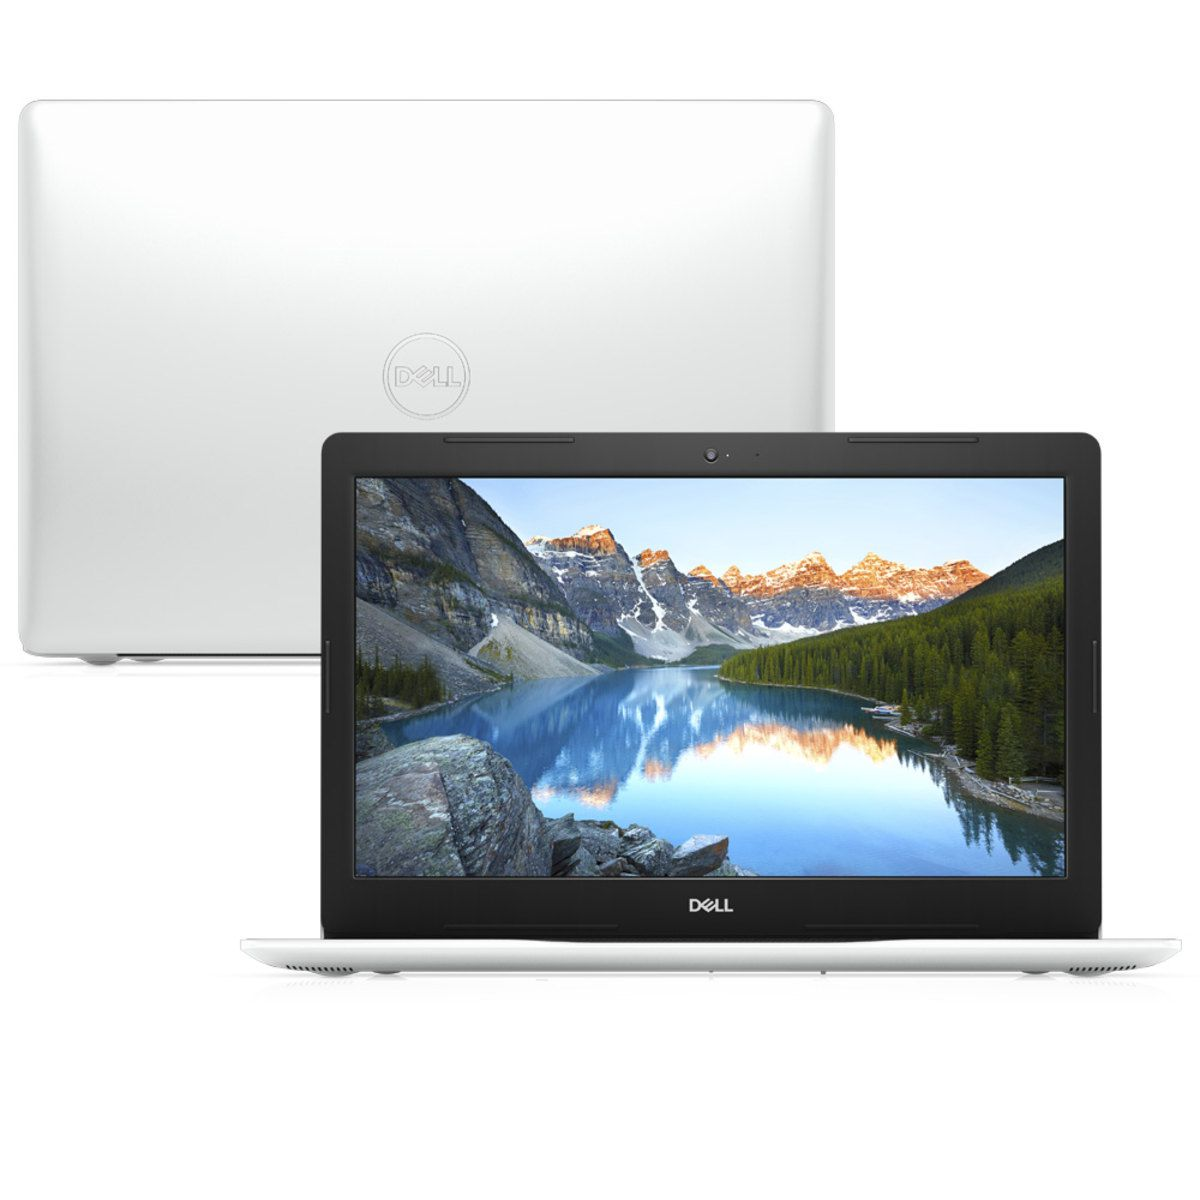 Notebook Dell Inspiron 3583 i7-8565U| 8GB DDR4| HD 2TB| 15.6 FHD| Win10 Home